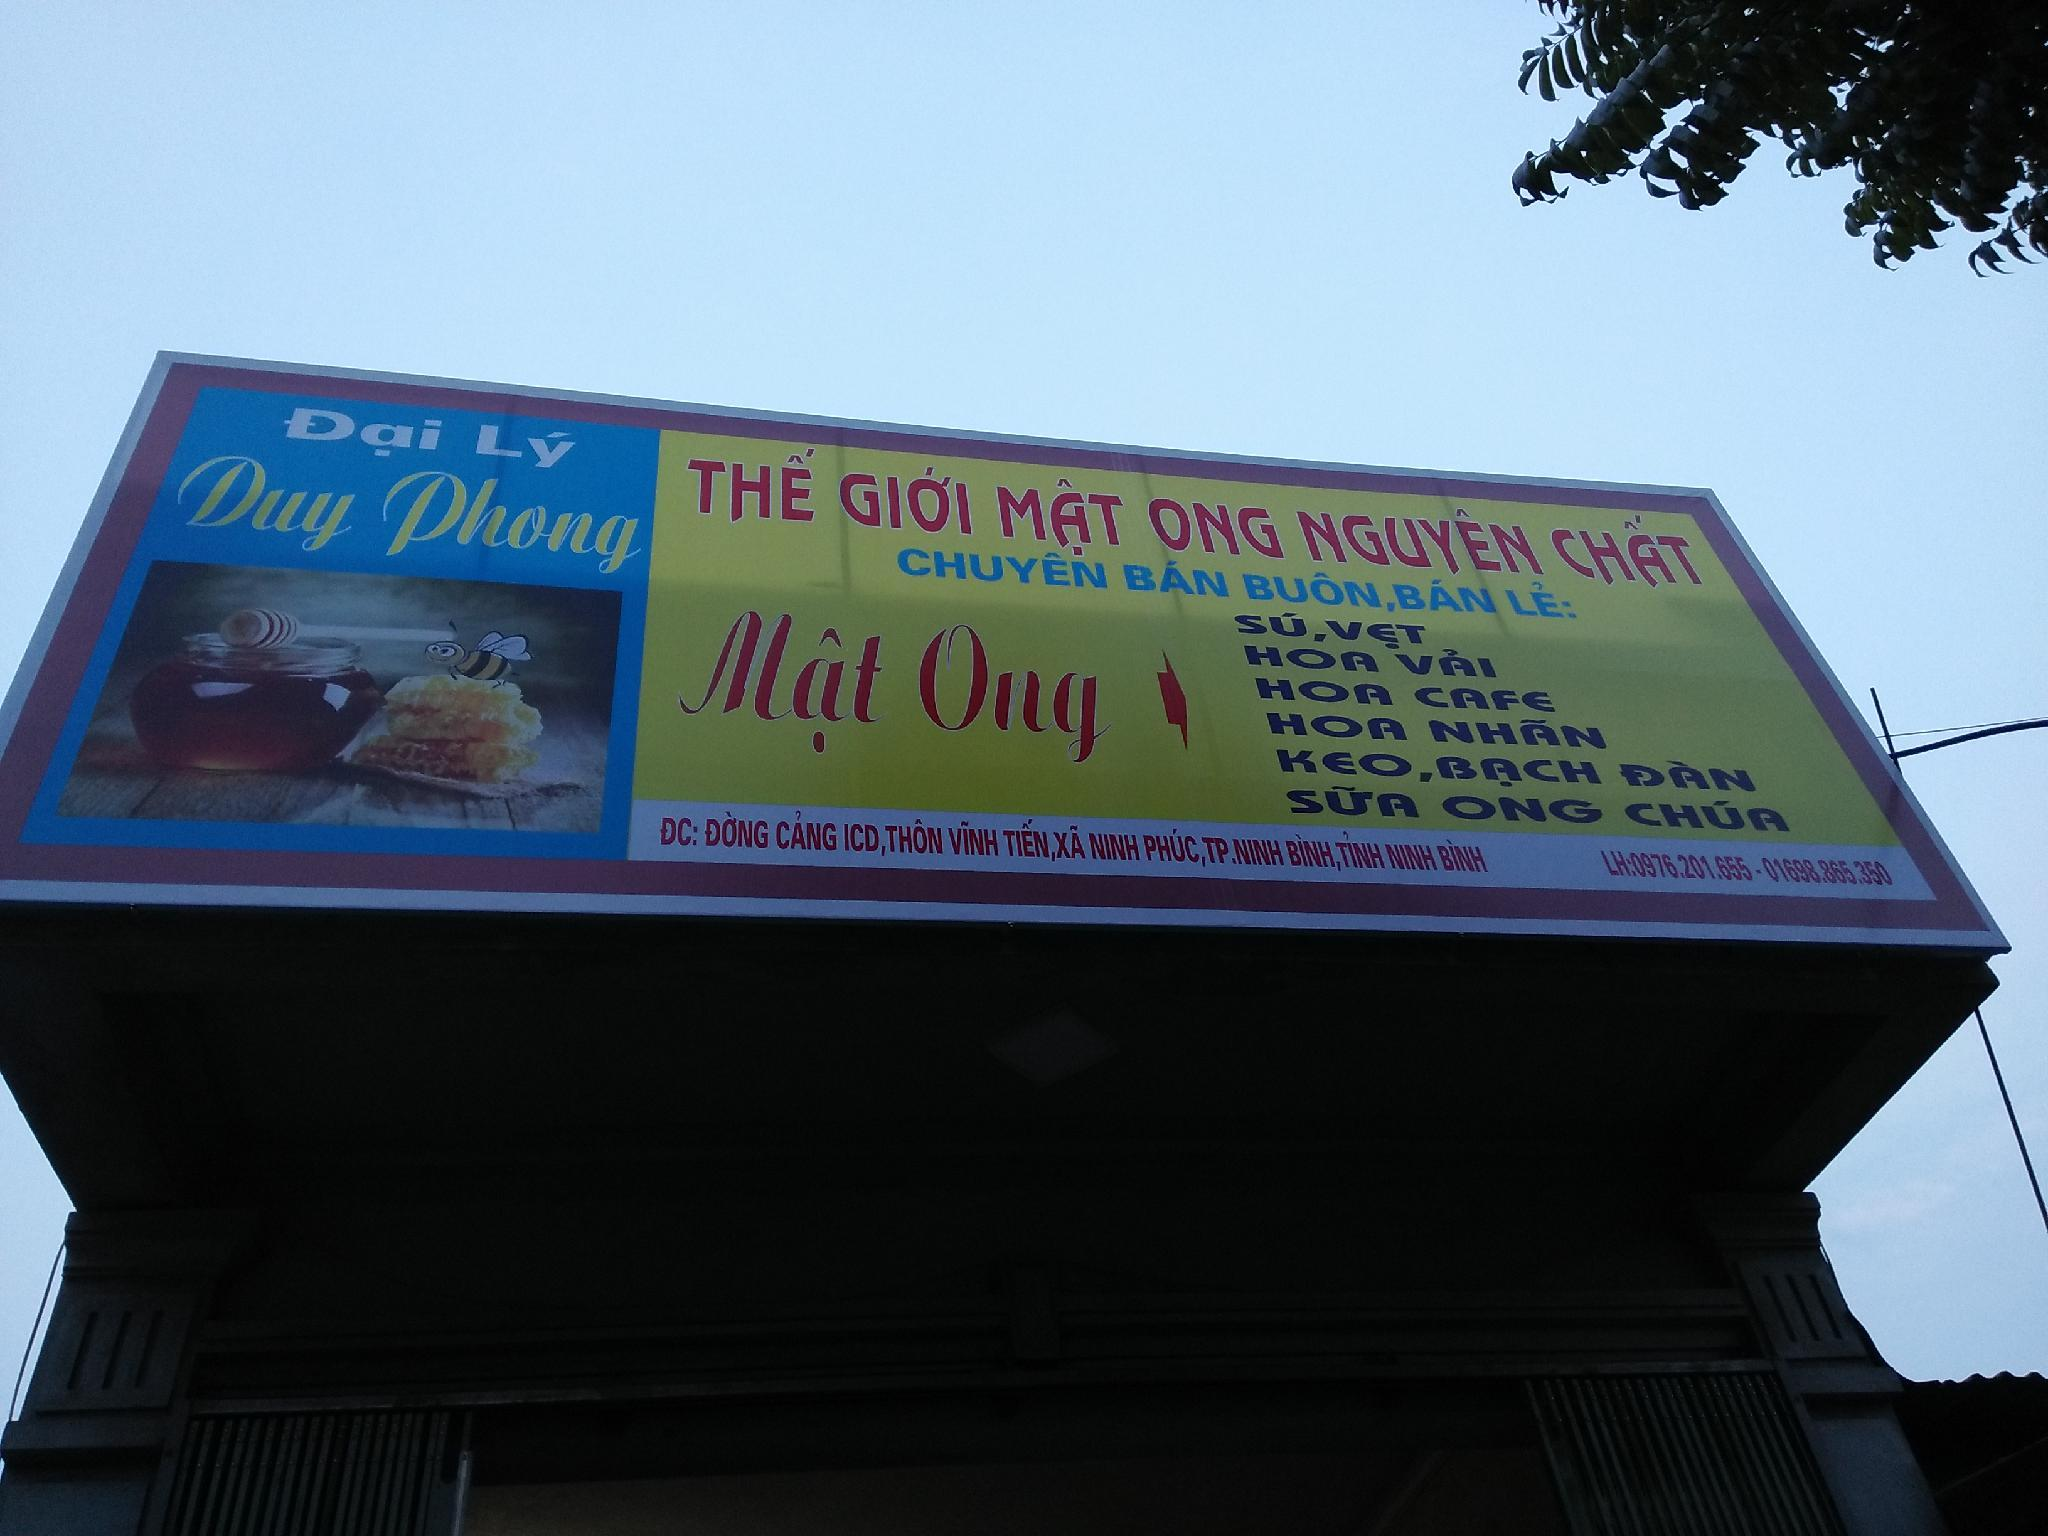 Mat Ong Nguyen Chat Duy Phong